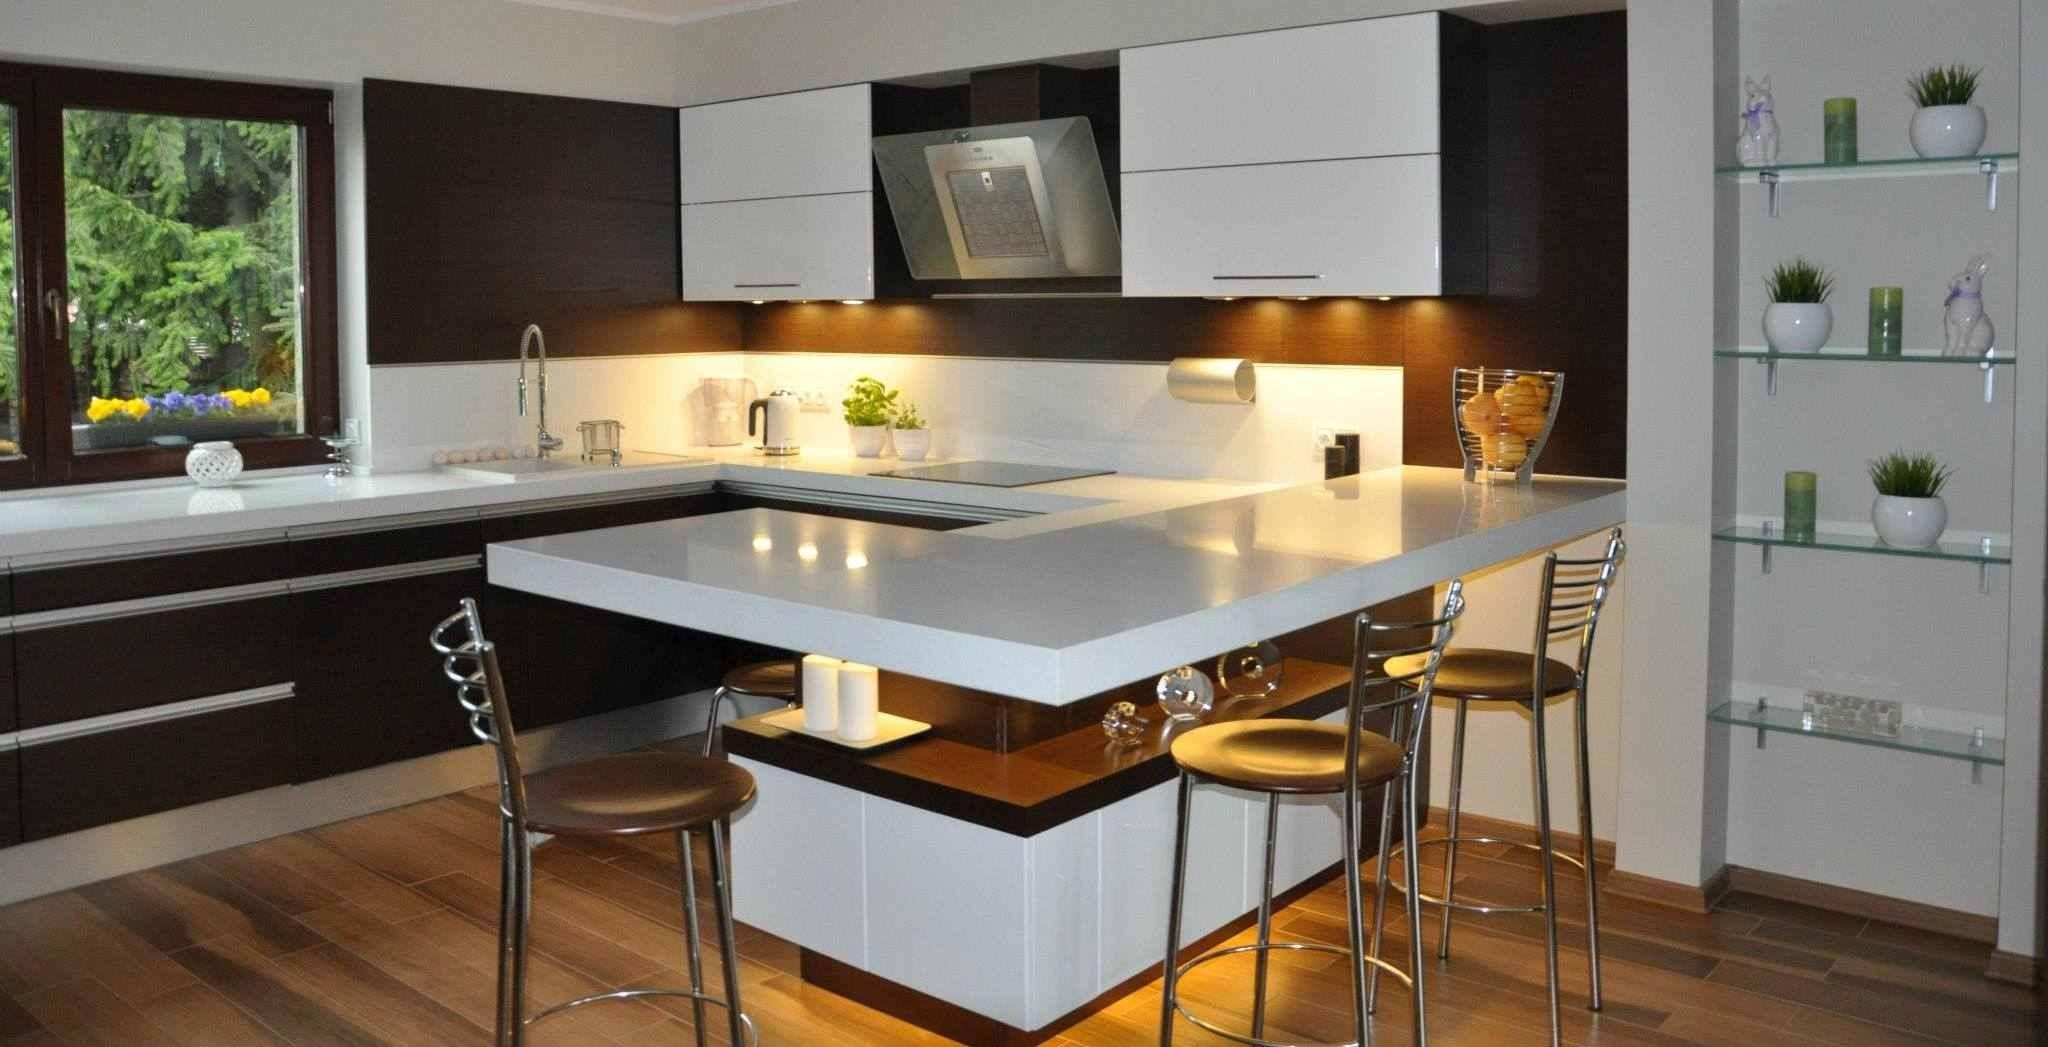 Nowoczesne Meble Kuchenne Meblobuk Furniture Home Home Decor